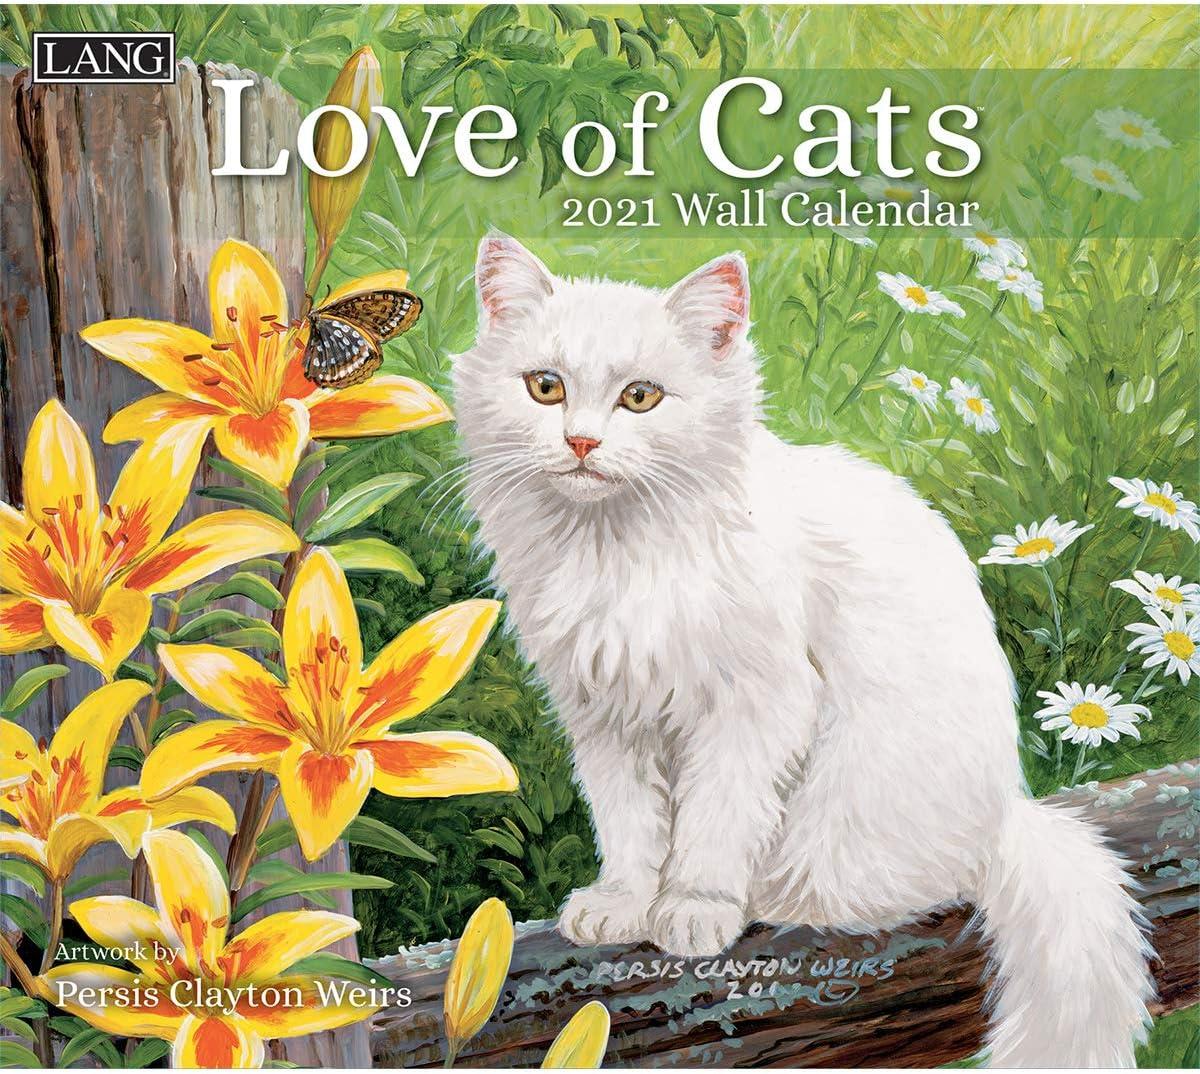 Amazon.: LANG Love of Cats 2021 Wall Calendar (21991001926